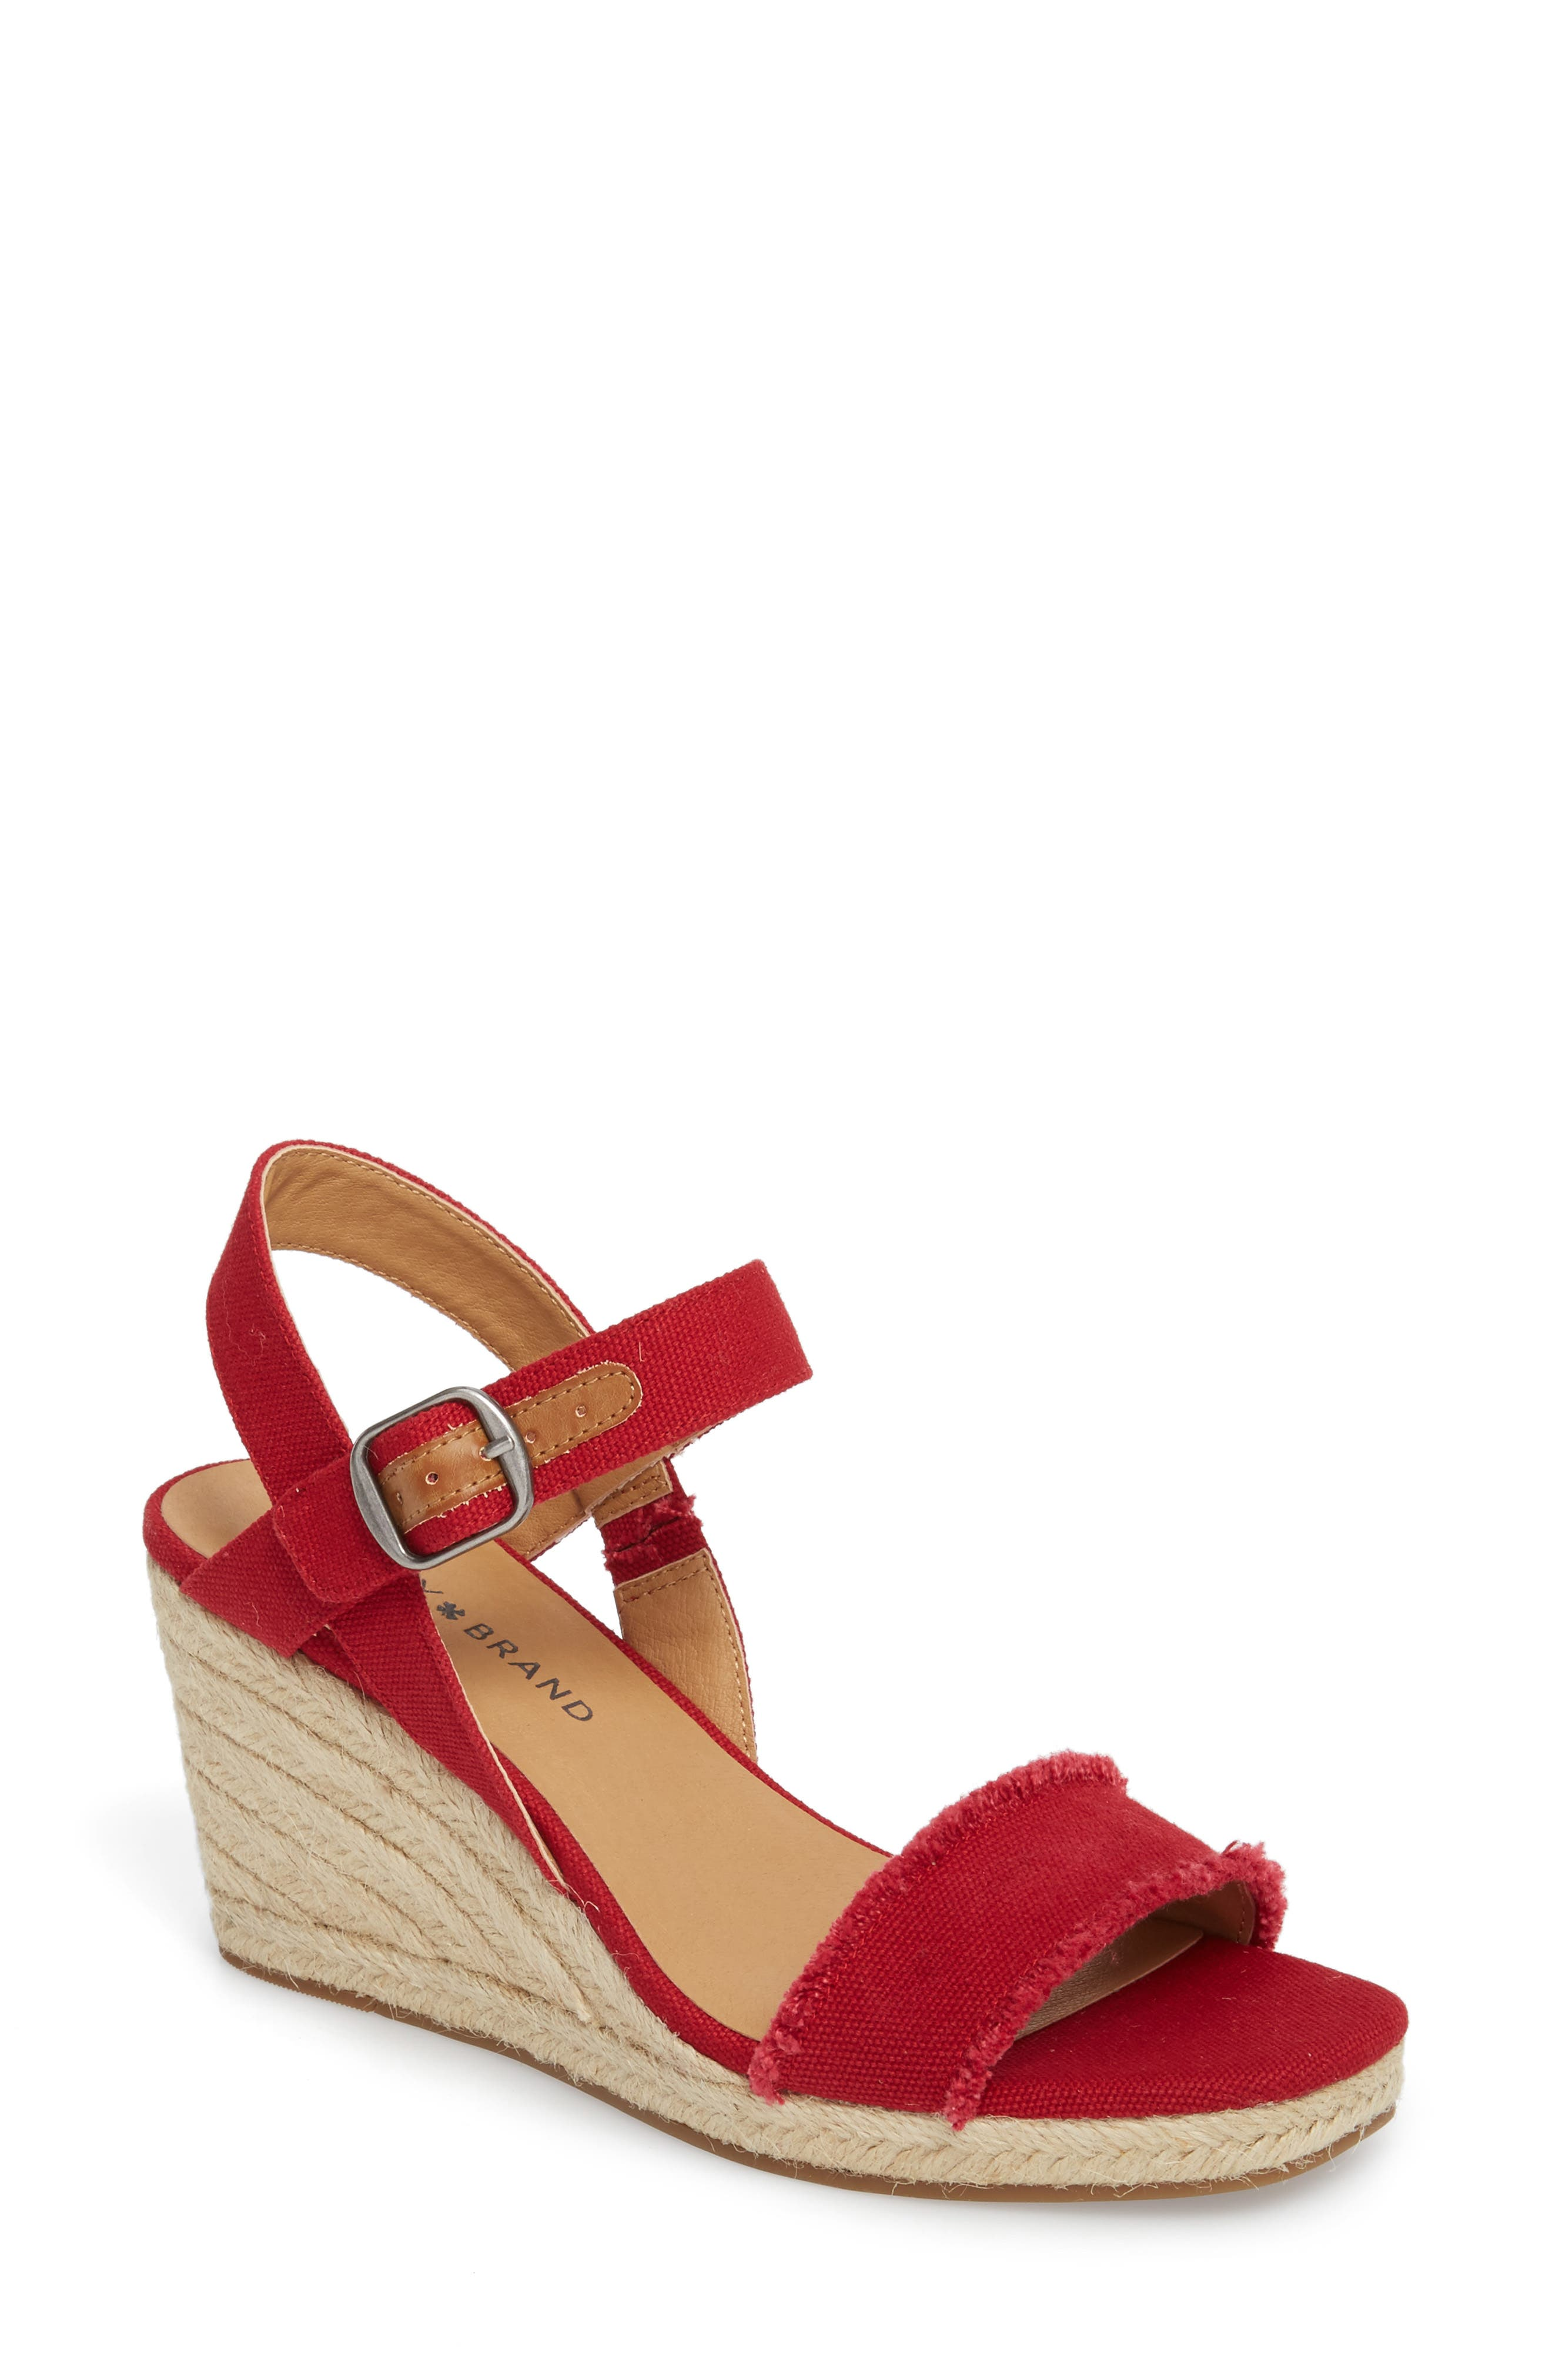 Marceline Squared Toe Wedge Sandal,                             Main thumbnail 7, color,